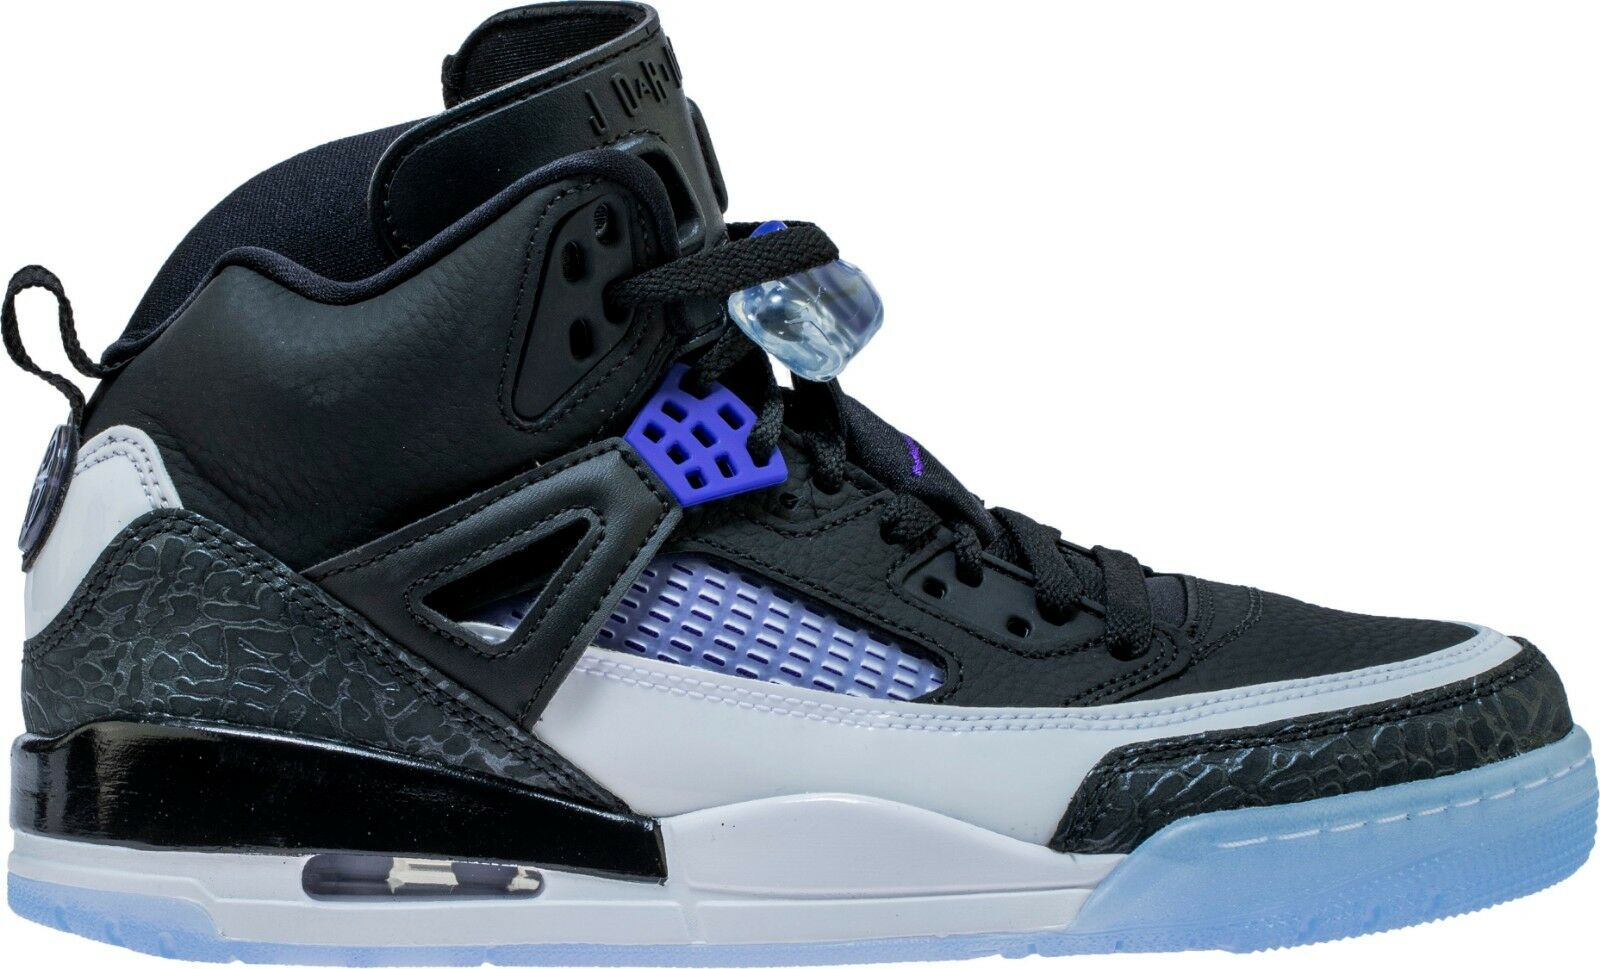 new styles f426d 80307 Jordan Jordan Jordan SPIZIKE Mens Black Dark Concord-White 315371-005  Sneaker shoes c2c3cd